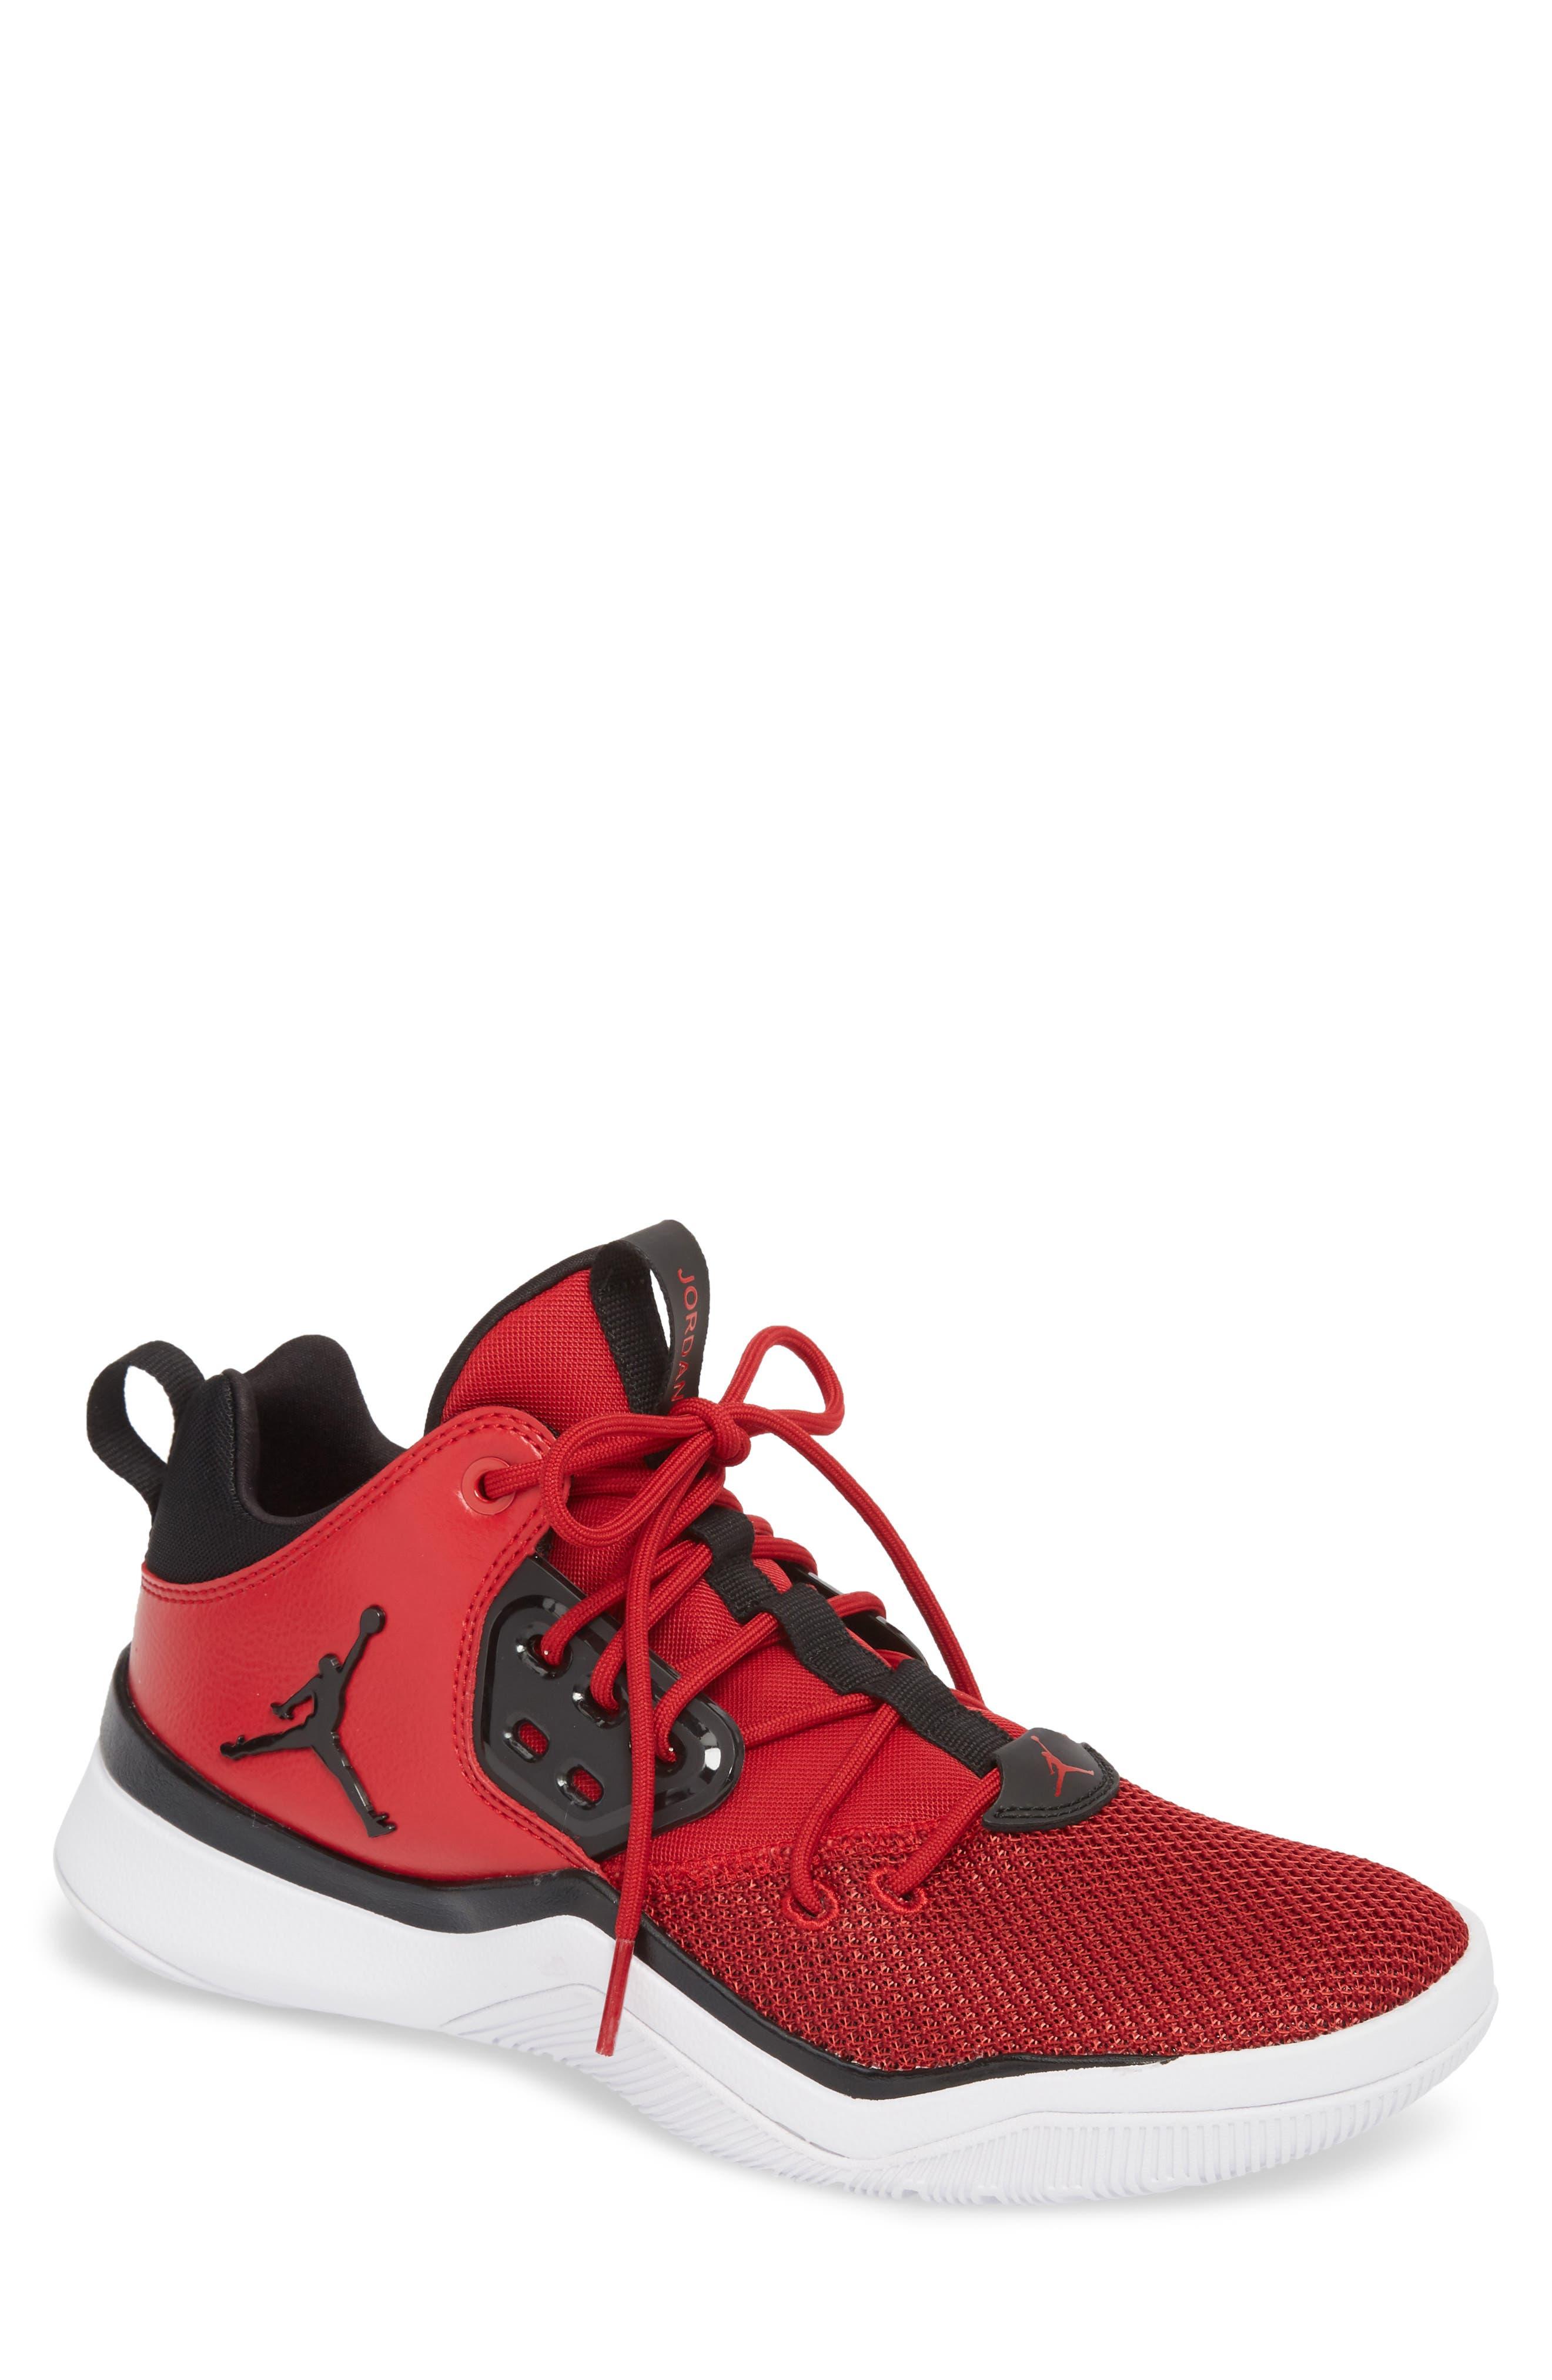 Jordan DNA Sneaker,                             Main thumbnail 1, color,                             Gym Red/ Black/ White